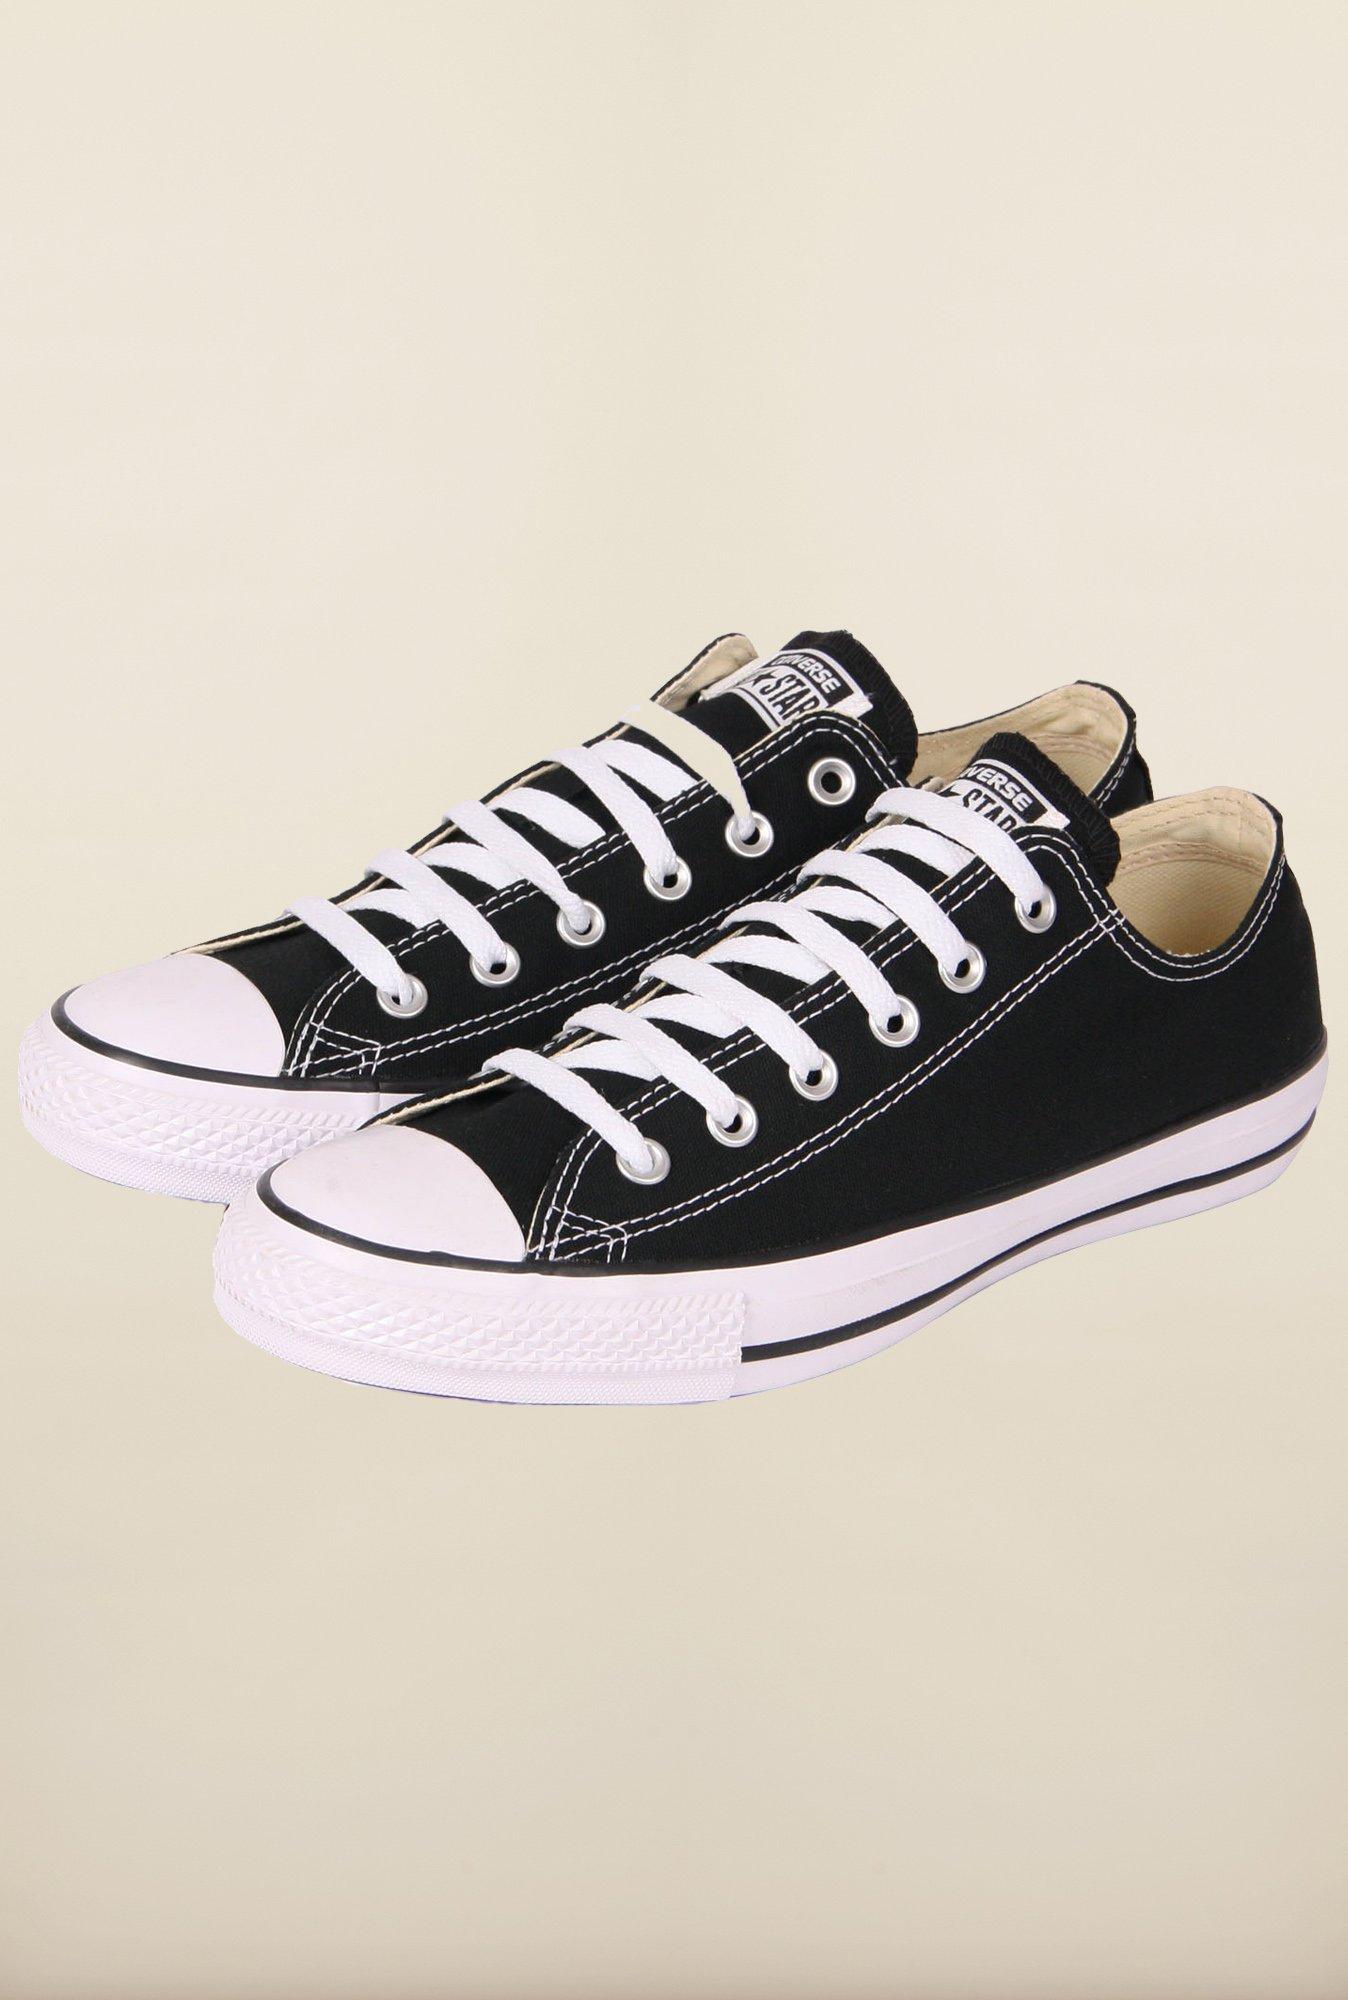 converse shoes. converse black sneakers shoes a